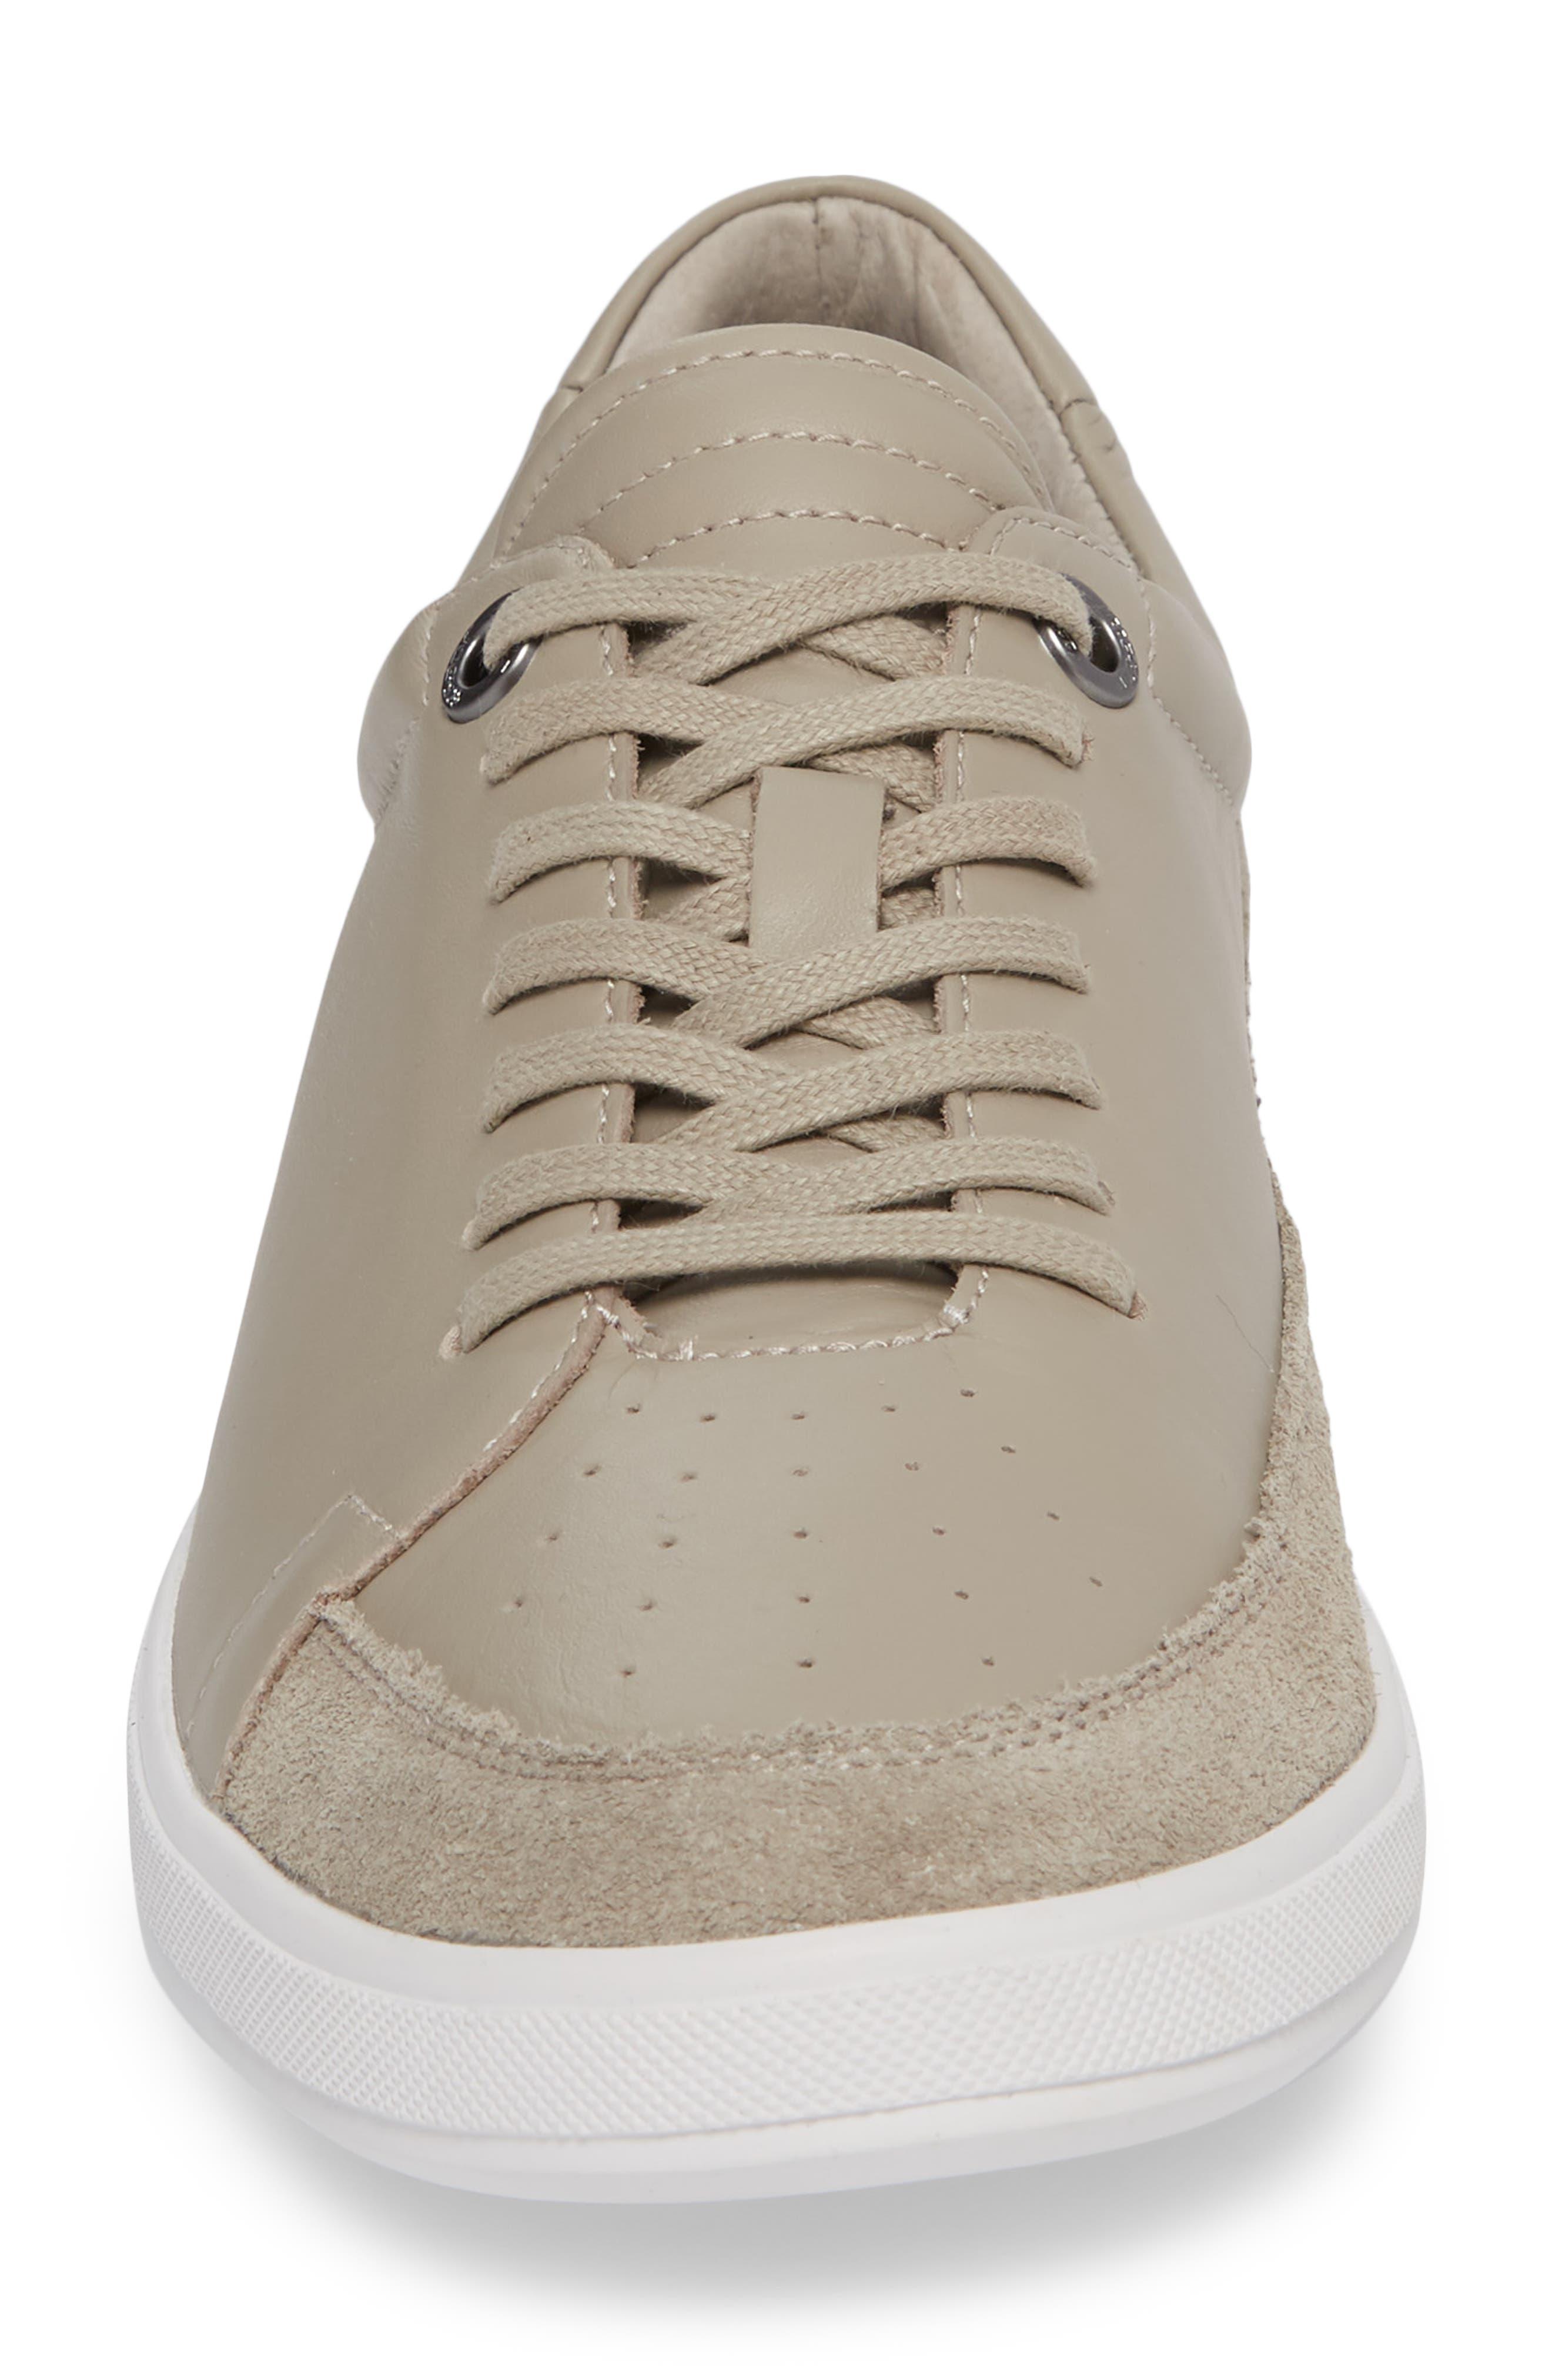 Joe Classic Low Top Sneaker,                             Alternate thumbnail 4, color,                             Stone Leather